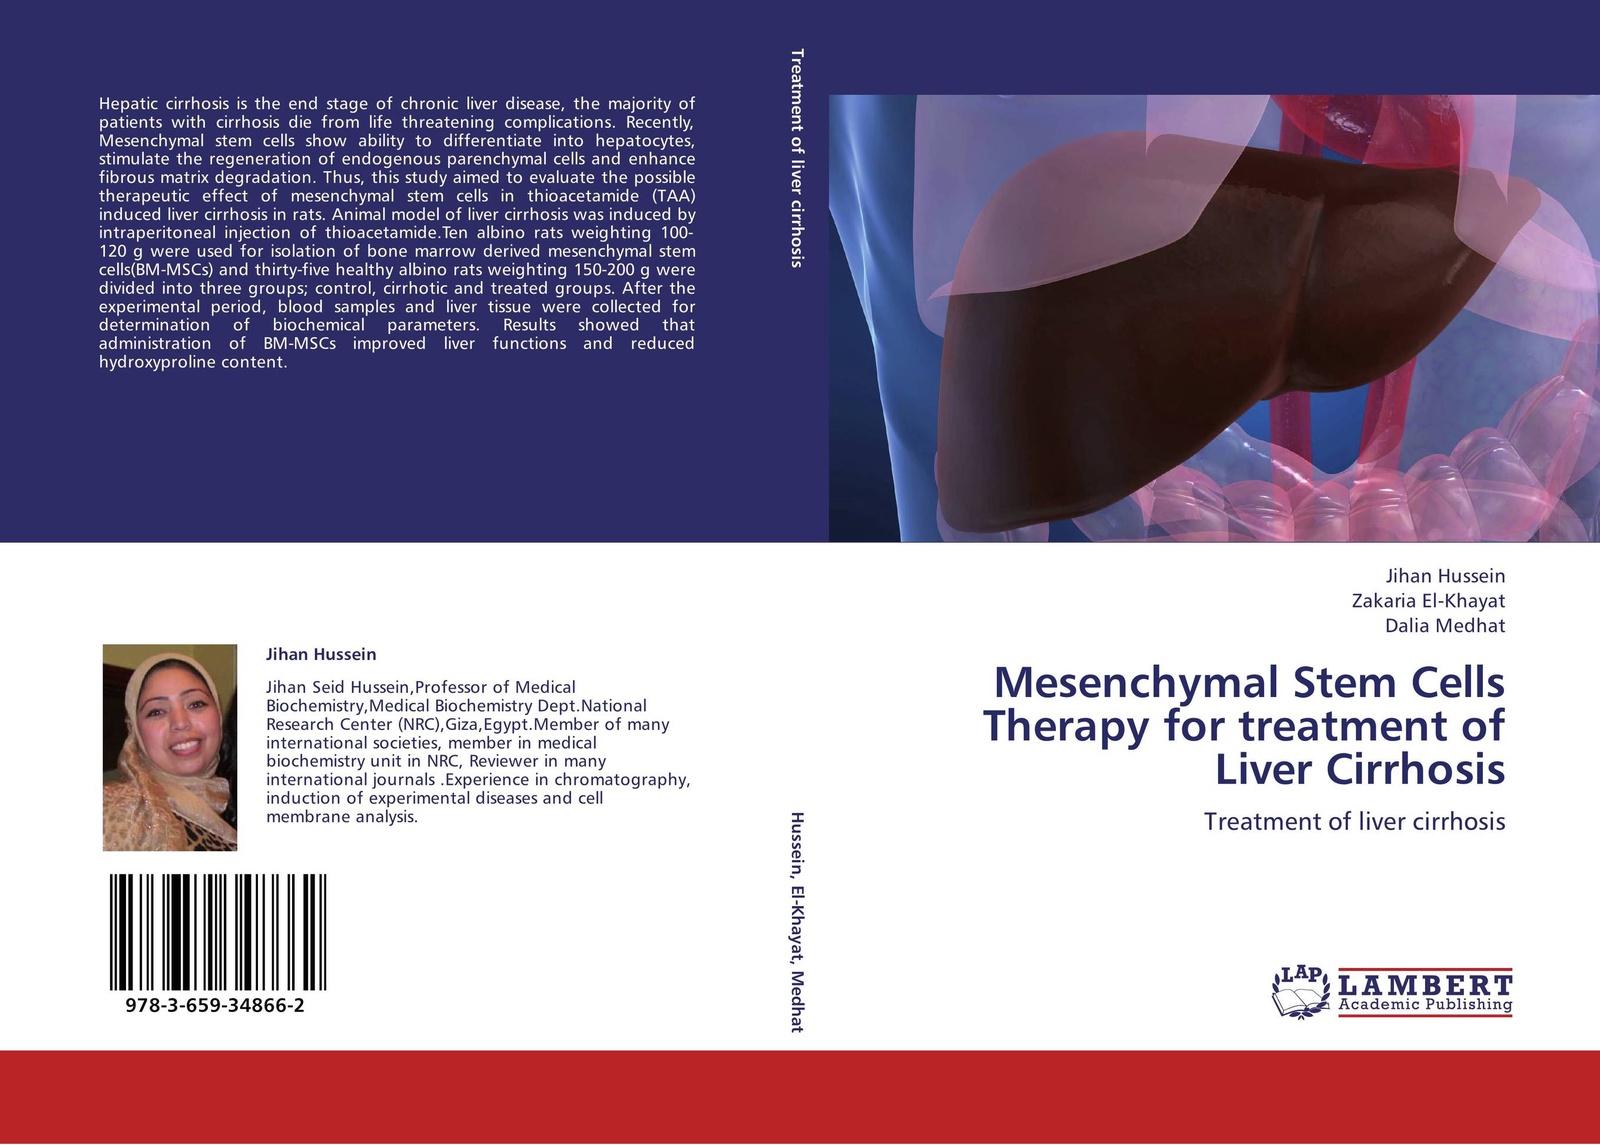 лучшая цена Jihan Hussein,Zakaria El-Khayat and Dalia Medhat Mesenchymal Stem Cells Therapy for treatment of Liver Cirrhosis